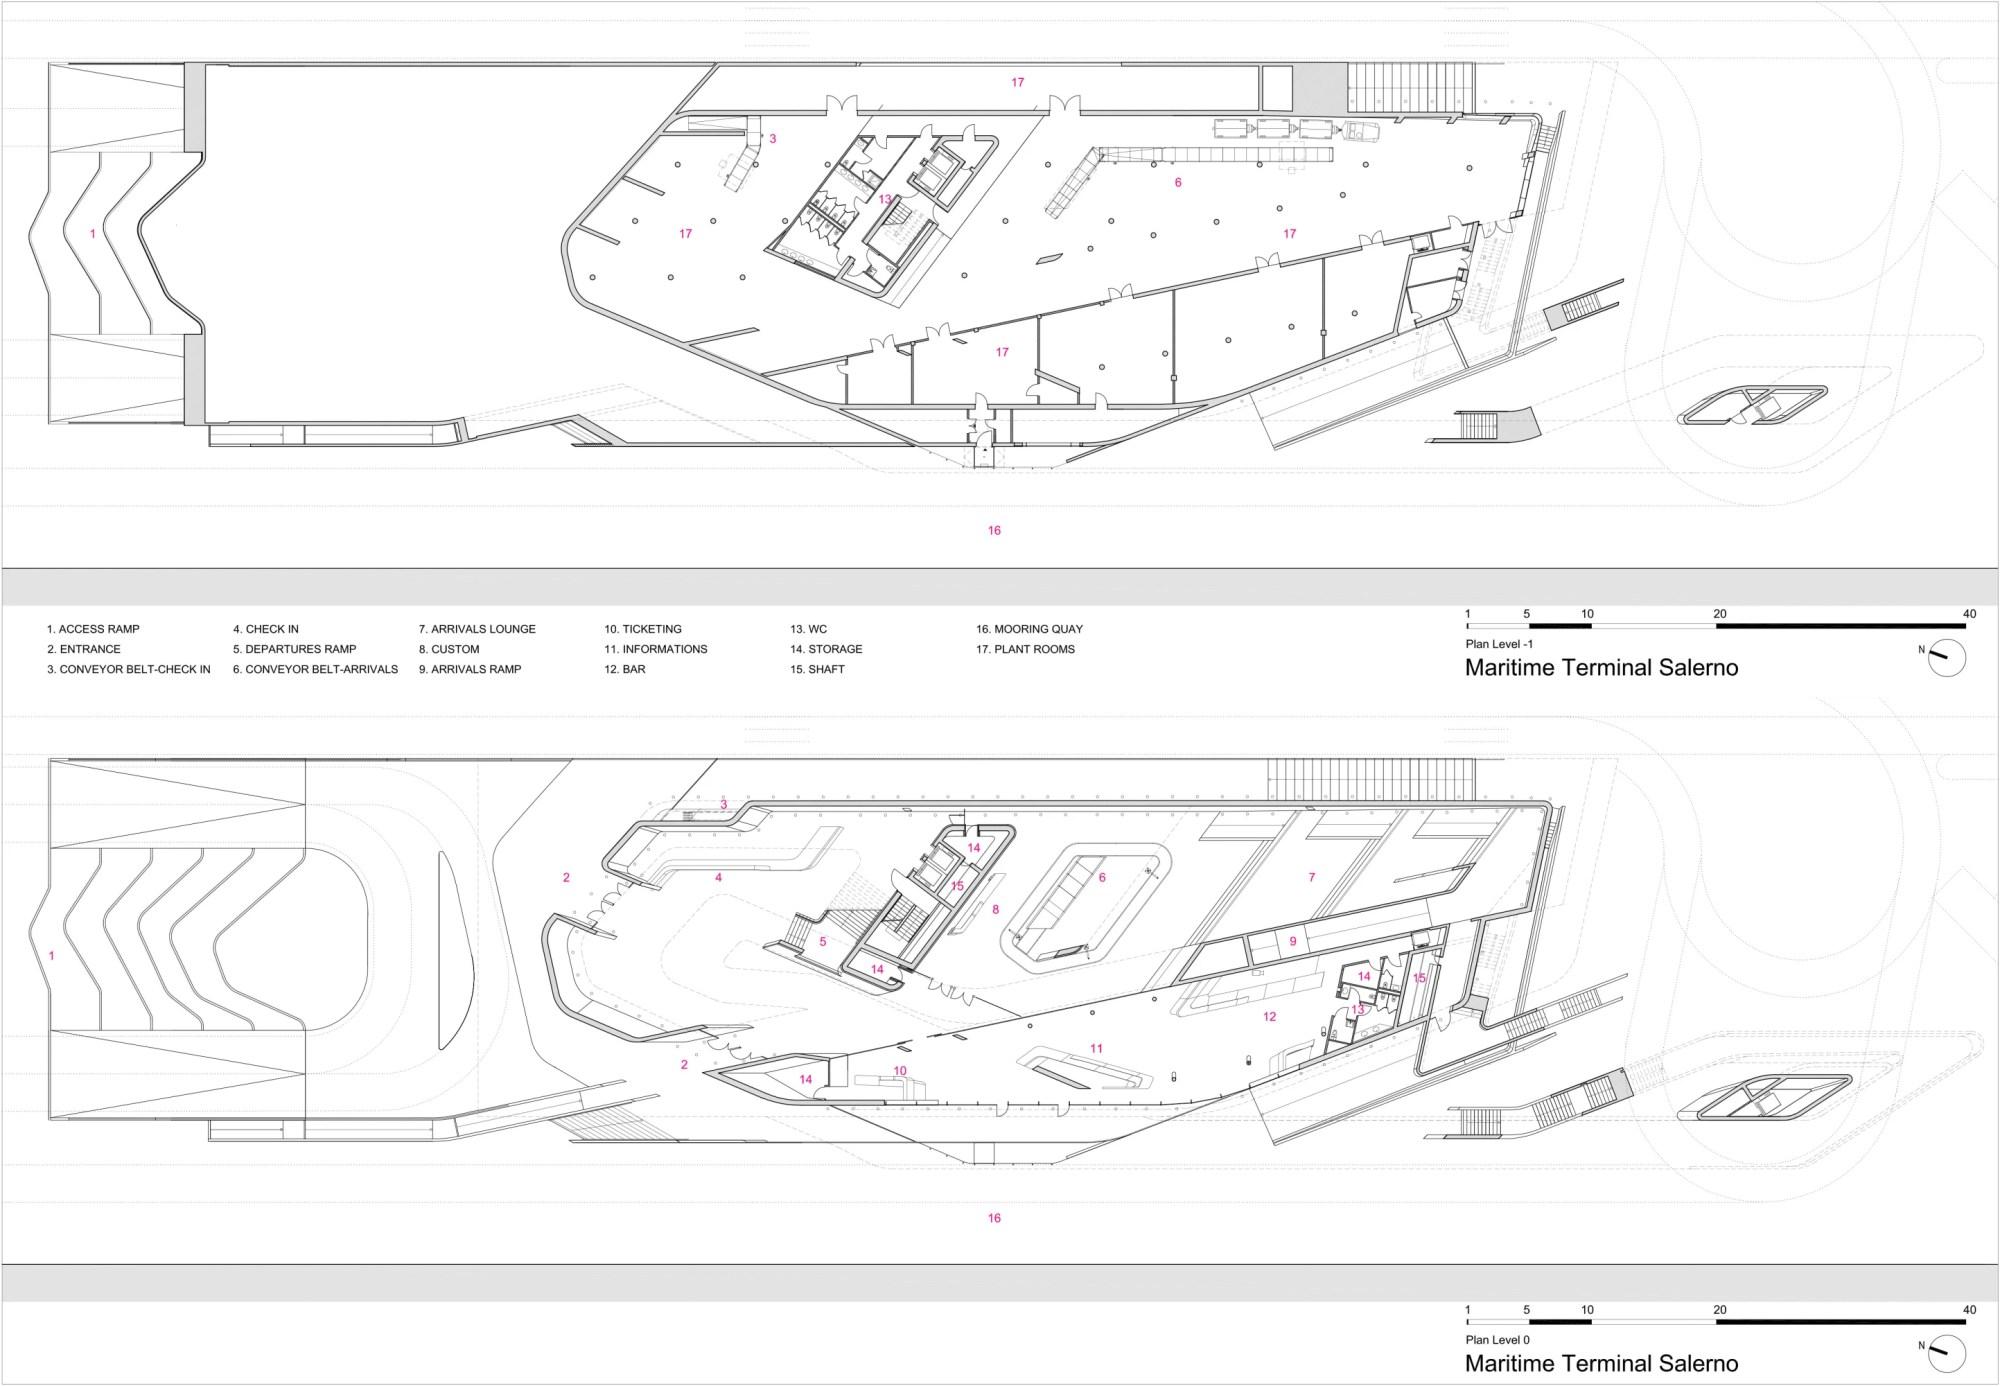 hight resolution of zaha hadid architects h l ne binet hufton crow salerno maritime terminal